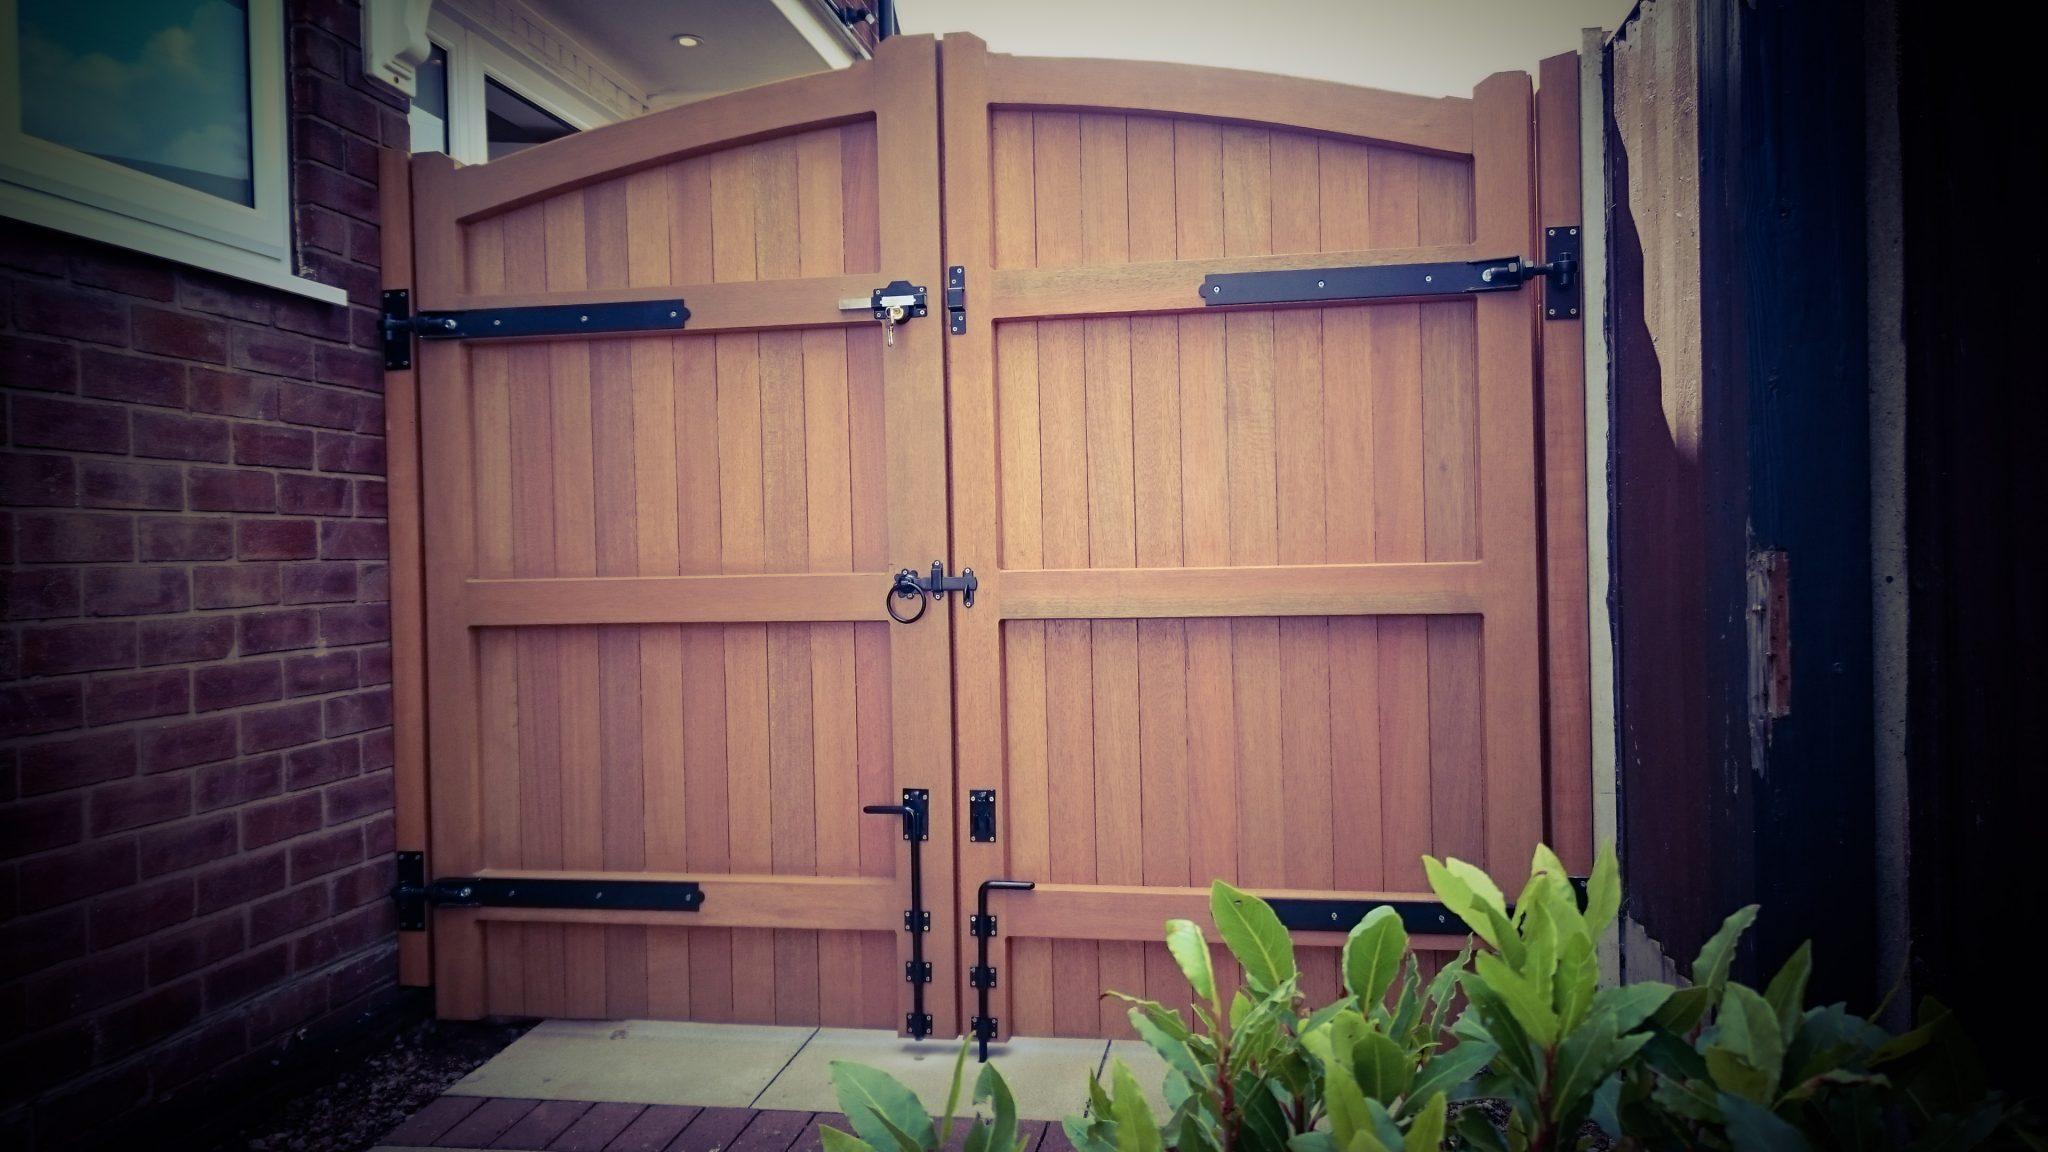 Lymm Design Meranti Hardwood from behind